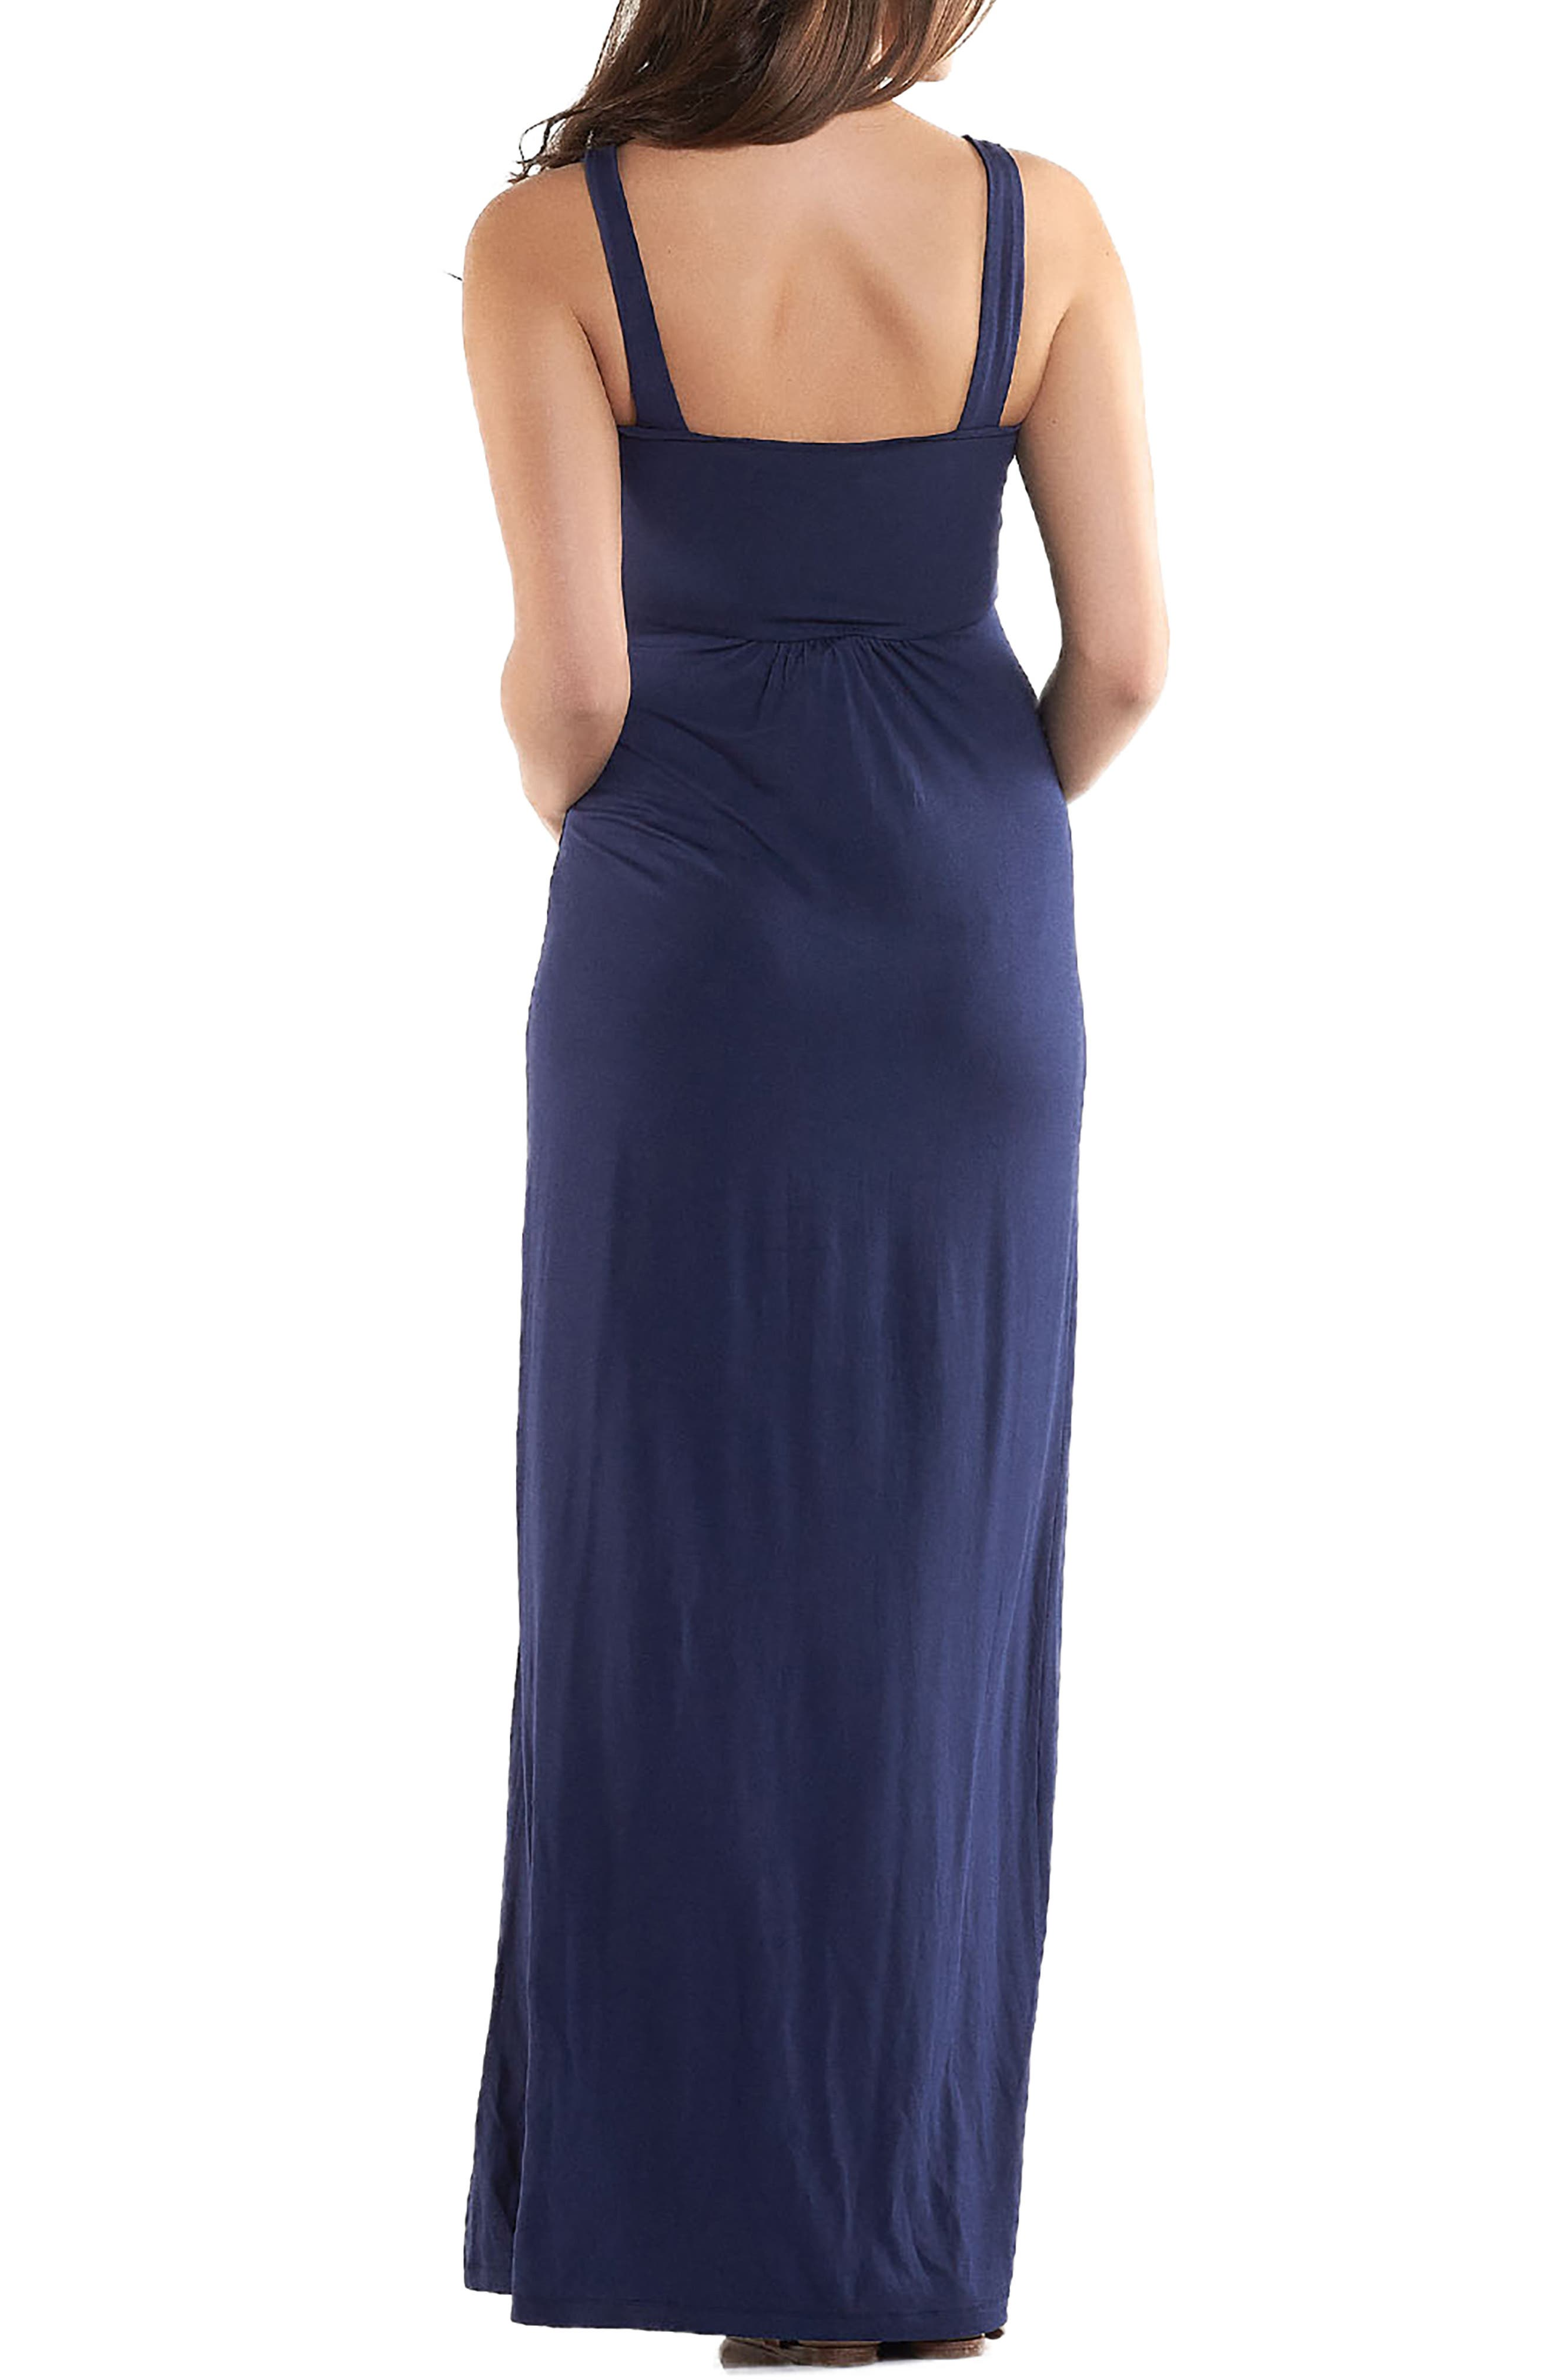 'Lynelle' Maternity Maxi Dress,                             Alternate thumbnail 2, color,                             PEACOAT